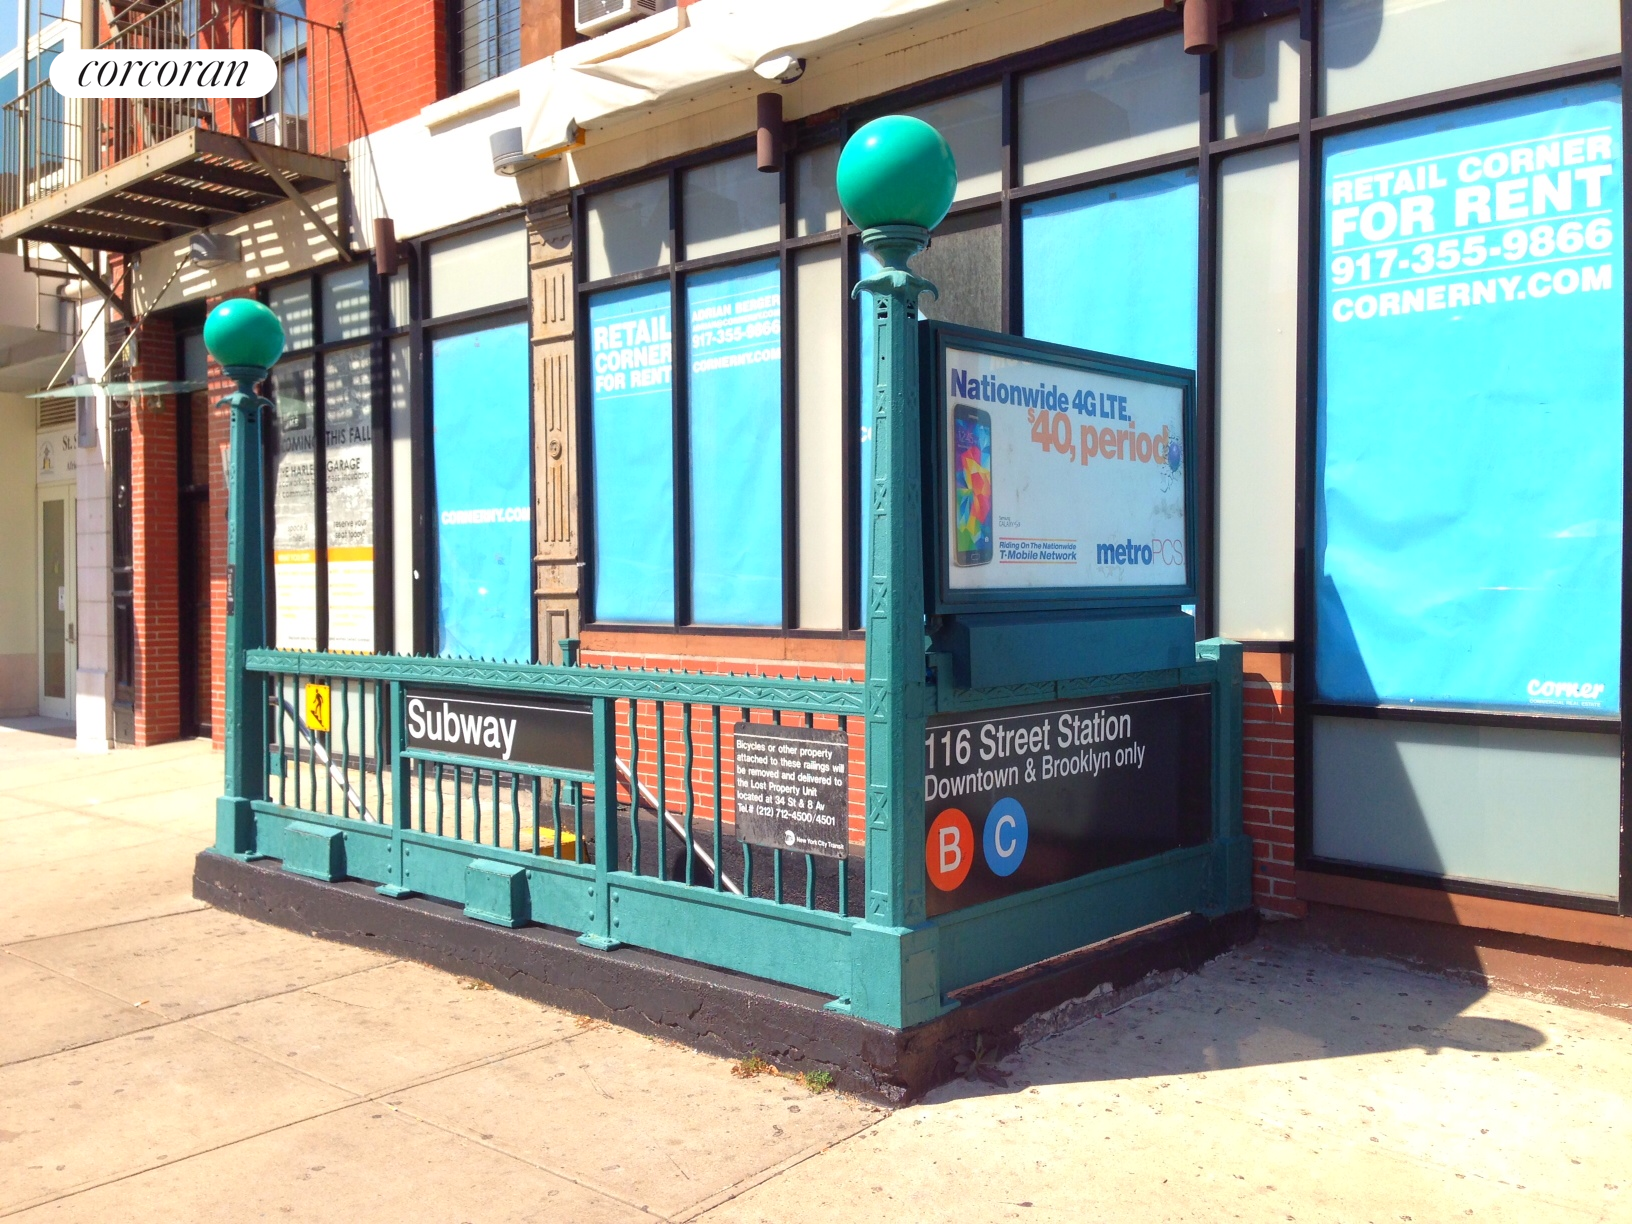 Corcoran, 370 West 116th Street, Apt. 1A, Harlem Rentals, Manhattan ...